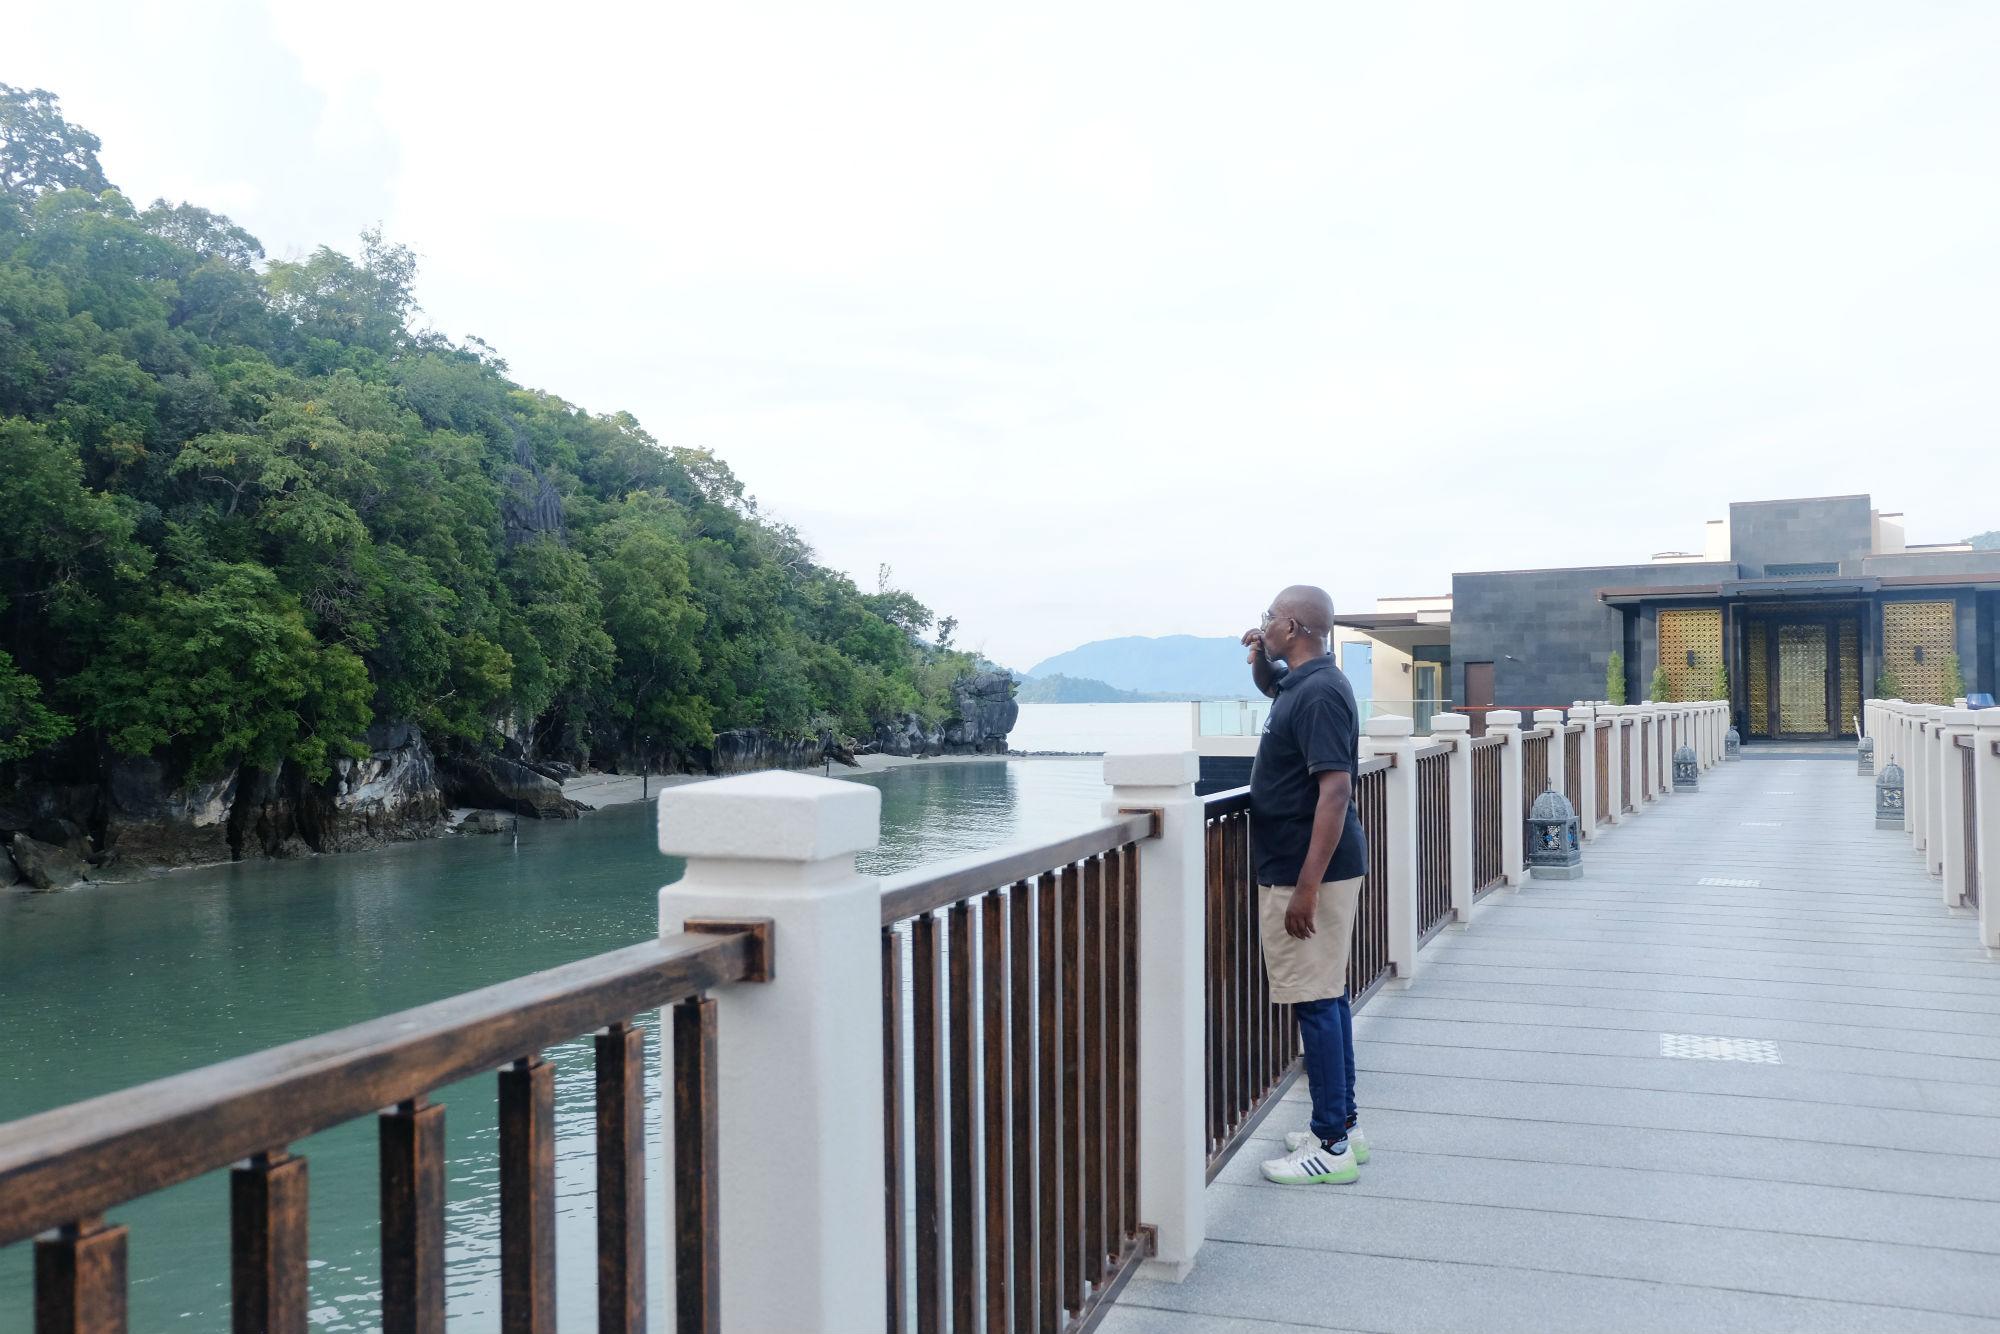 Hotel Naturalist St. Regis Langkawi